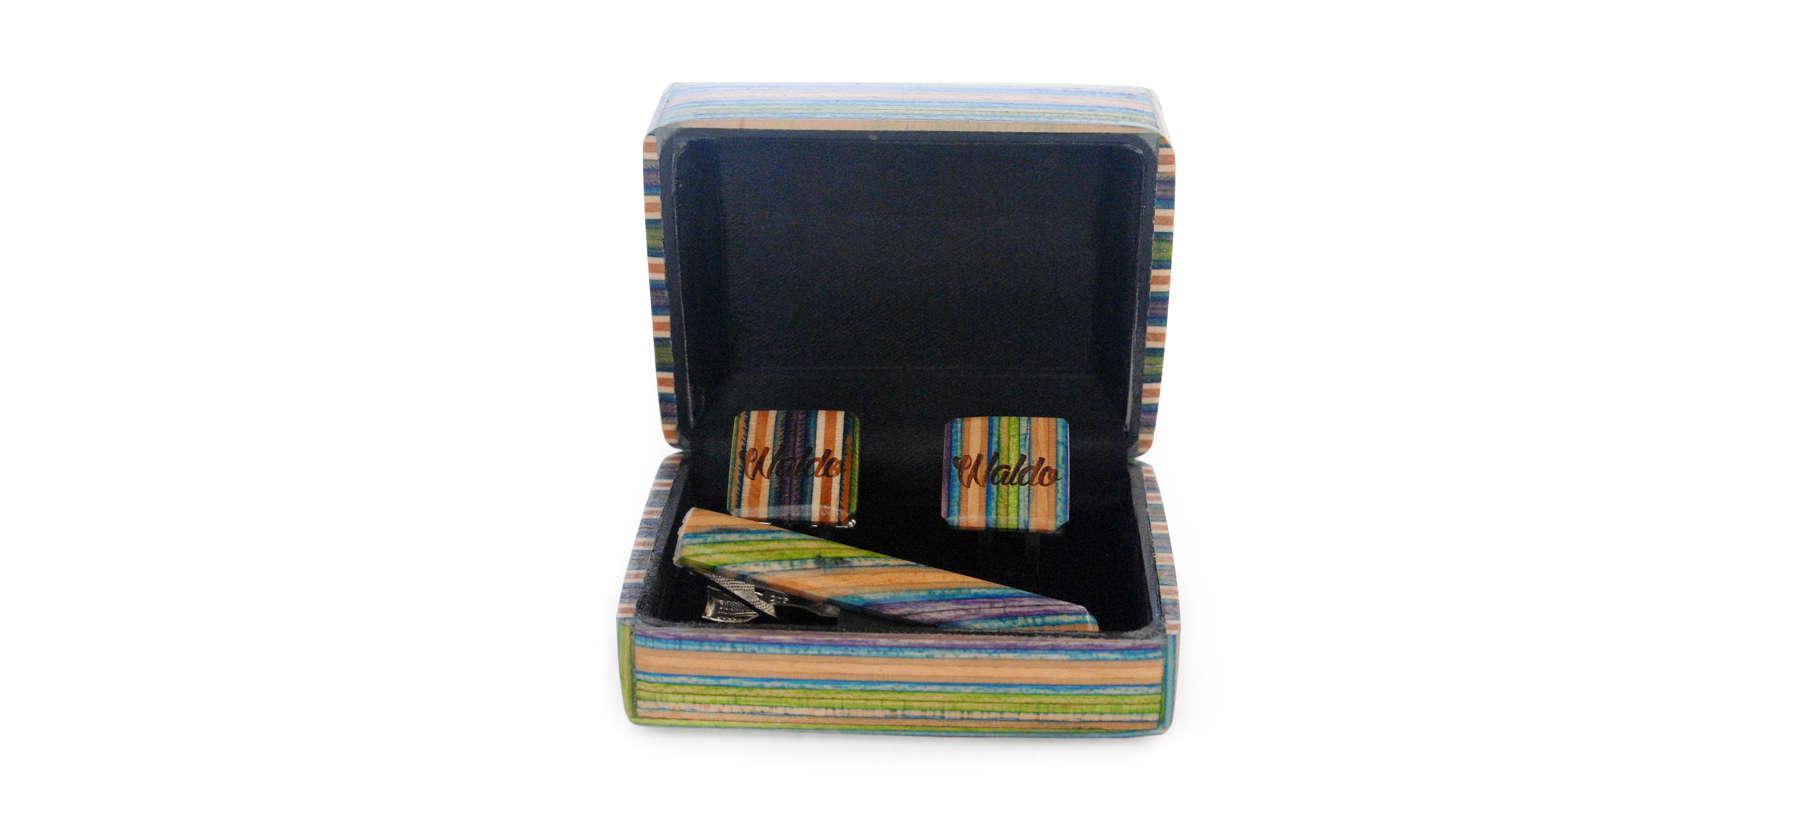 Waldo Cufflink gift box